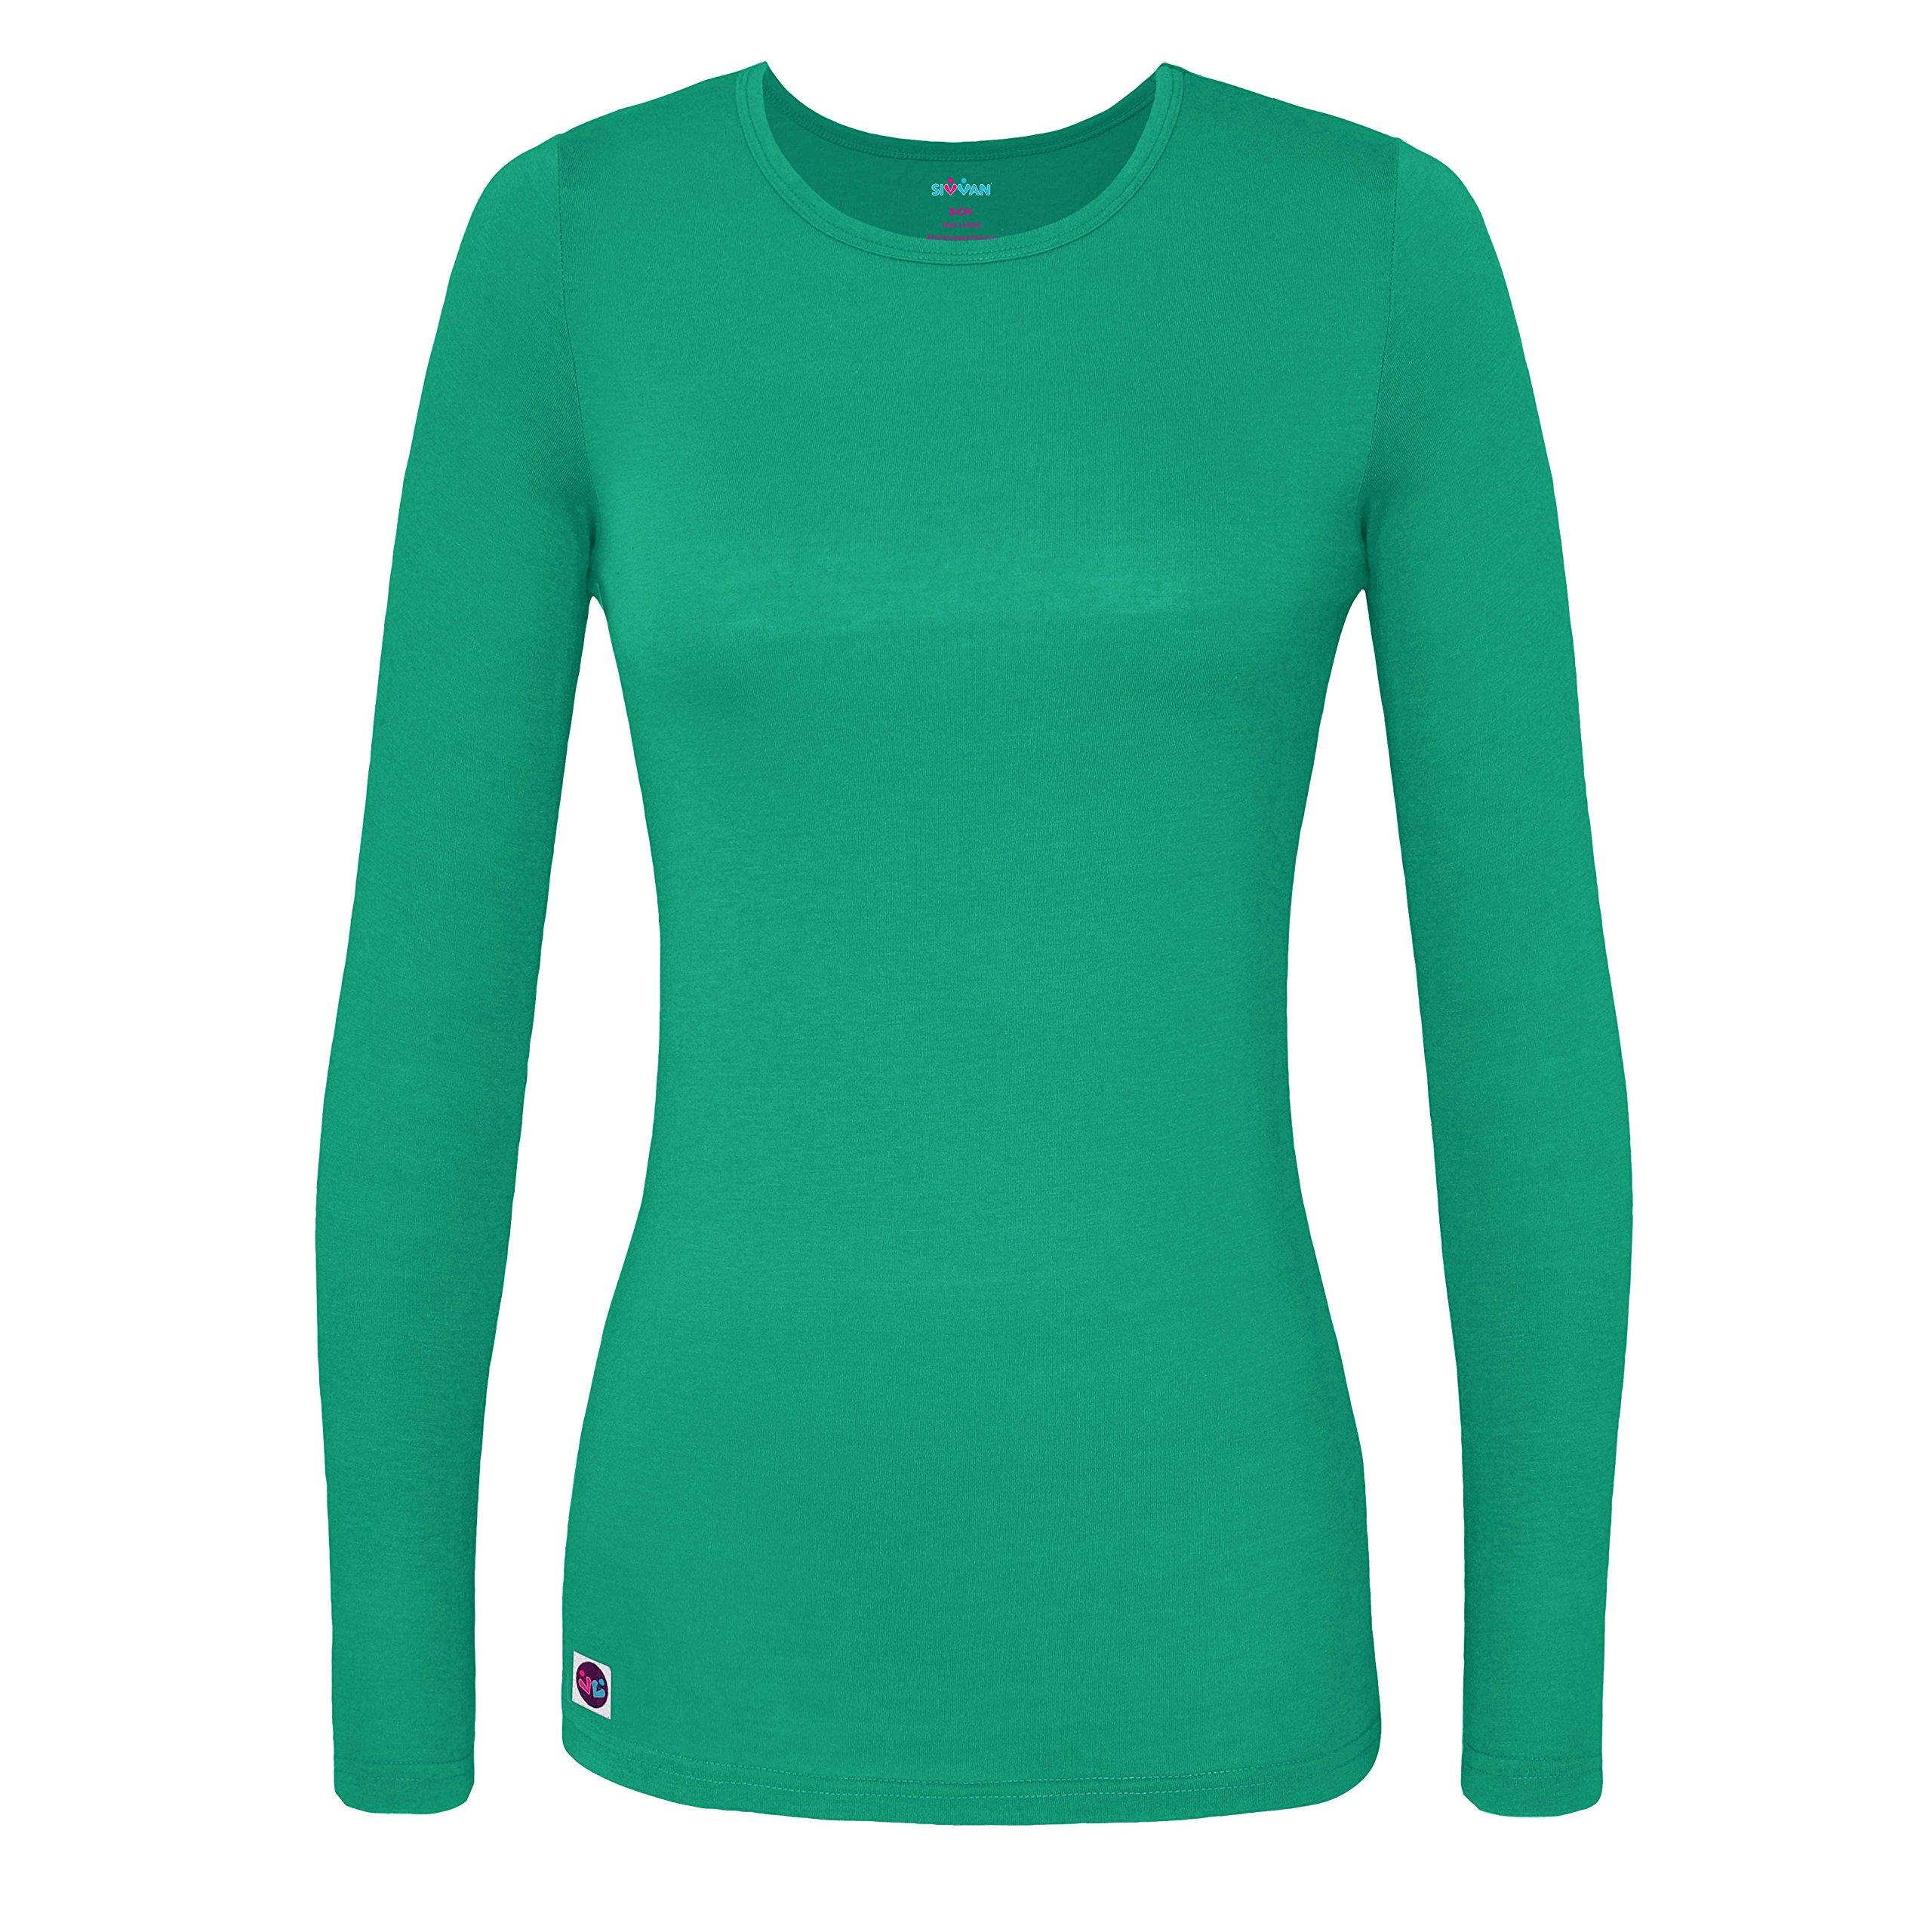 Sivvan Women's Comfort Long Sleeve T-Shirt/Underscrub Tee - S8500 - SMT - 2X